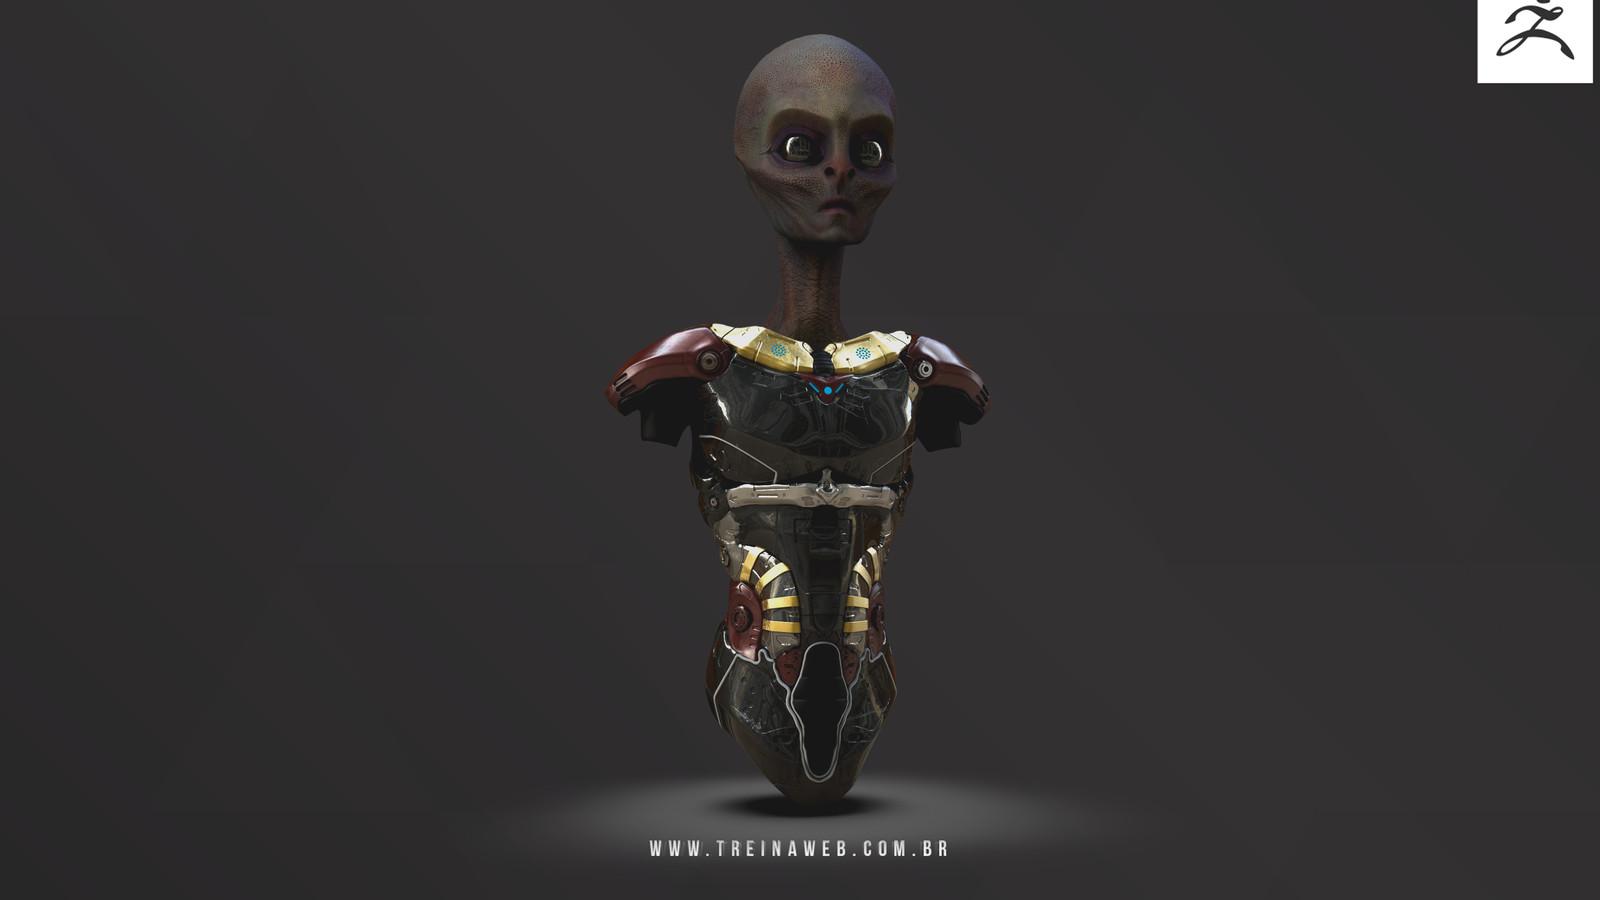 Alien Sculpture Work for Treinaweb Zbrush beginner class